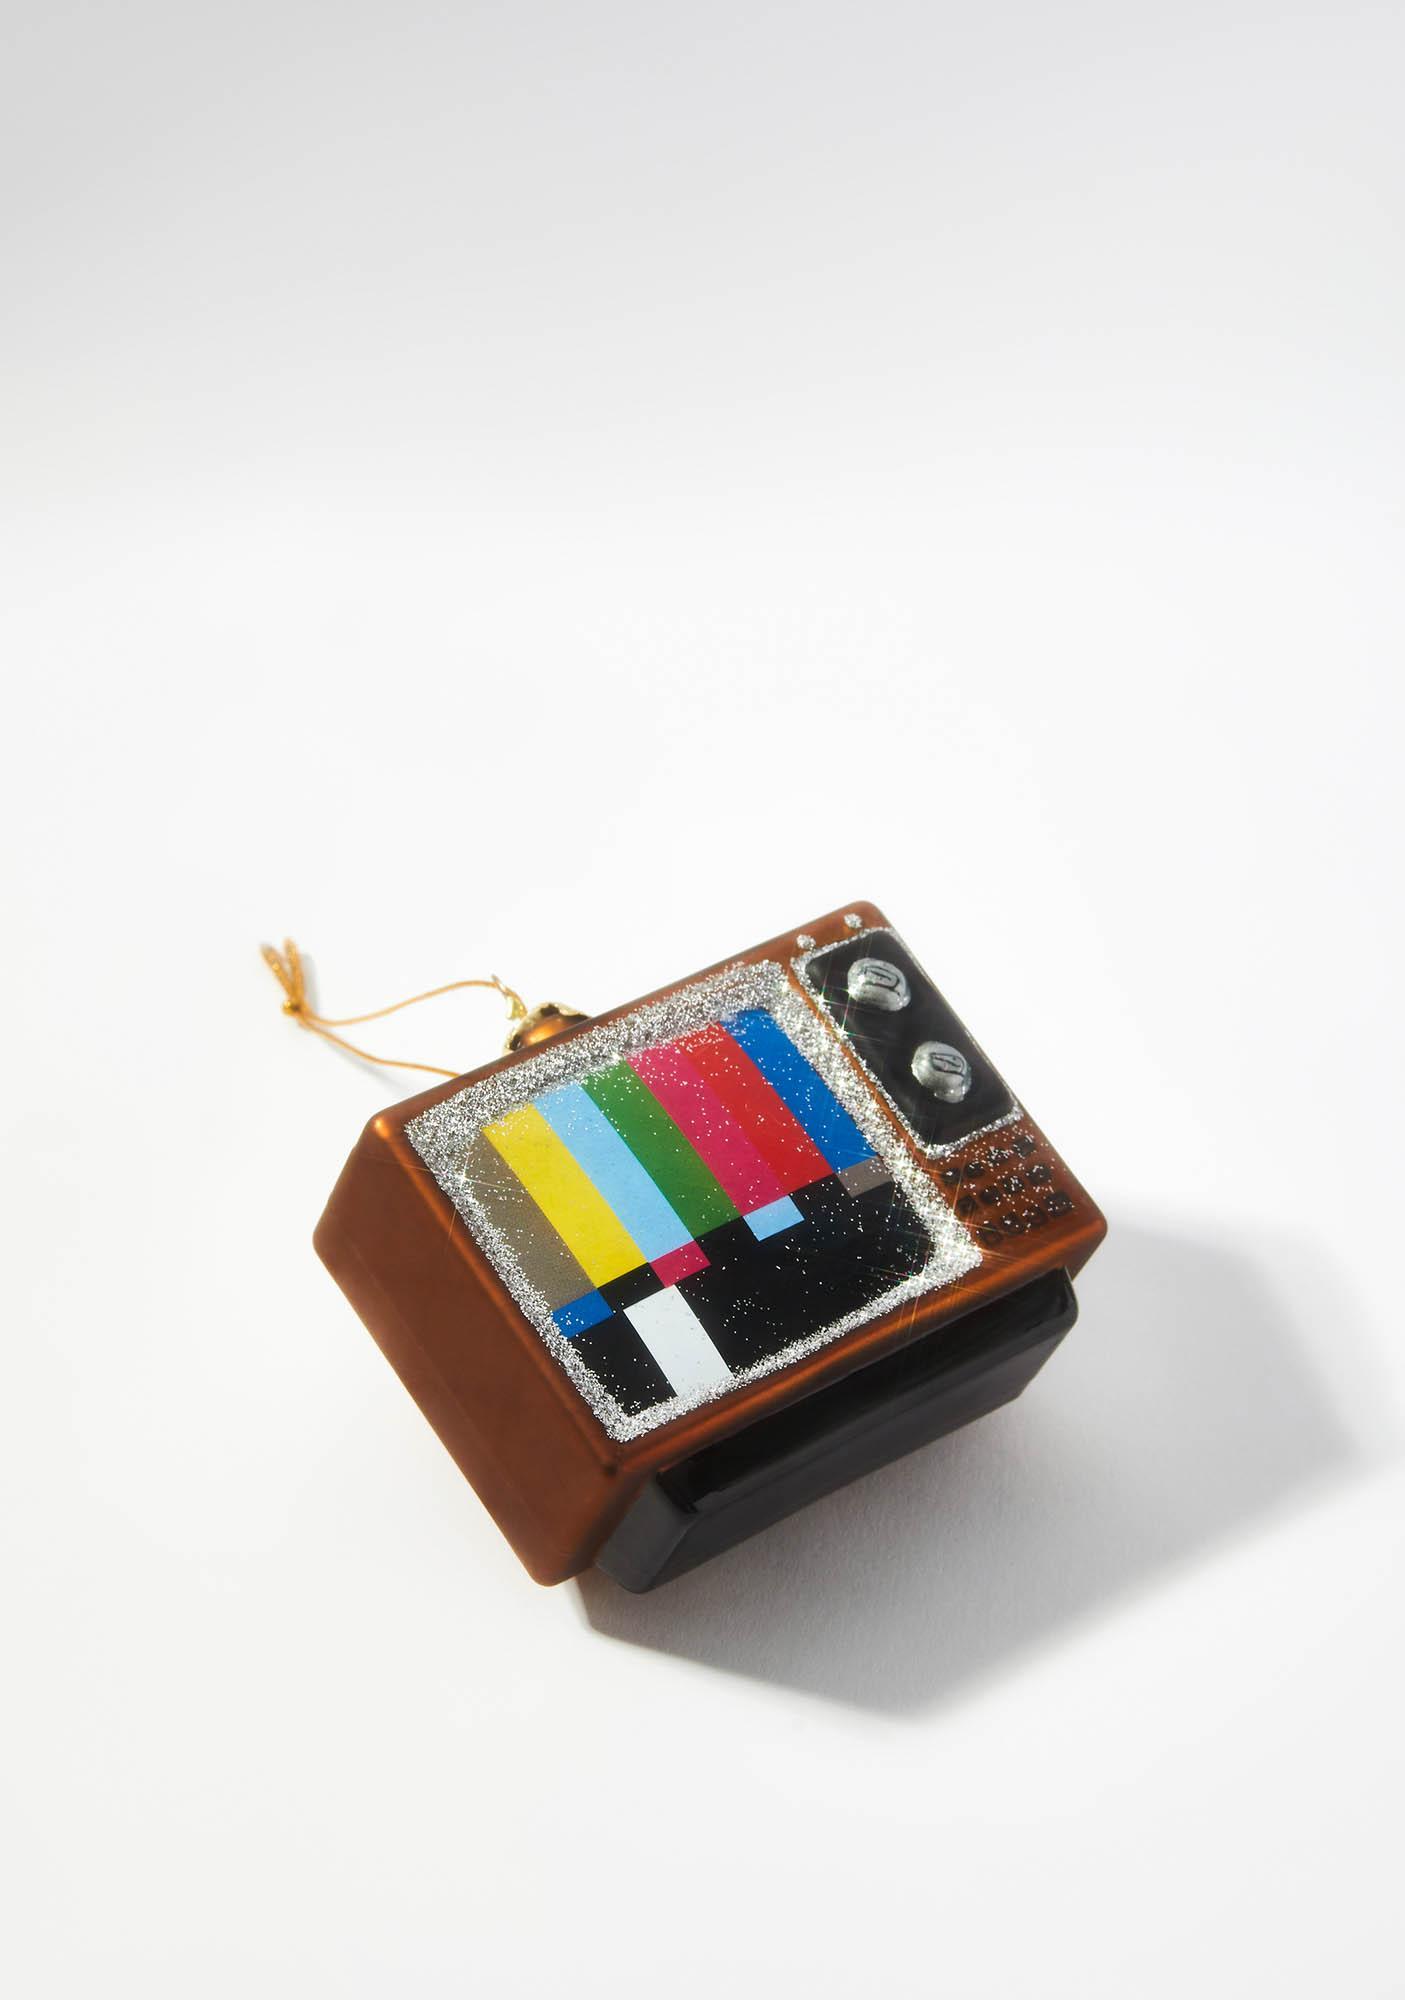 Life In Technicolor Vintage Television Ornament